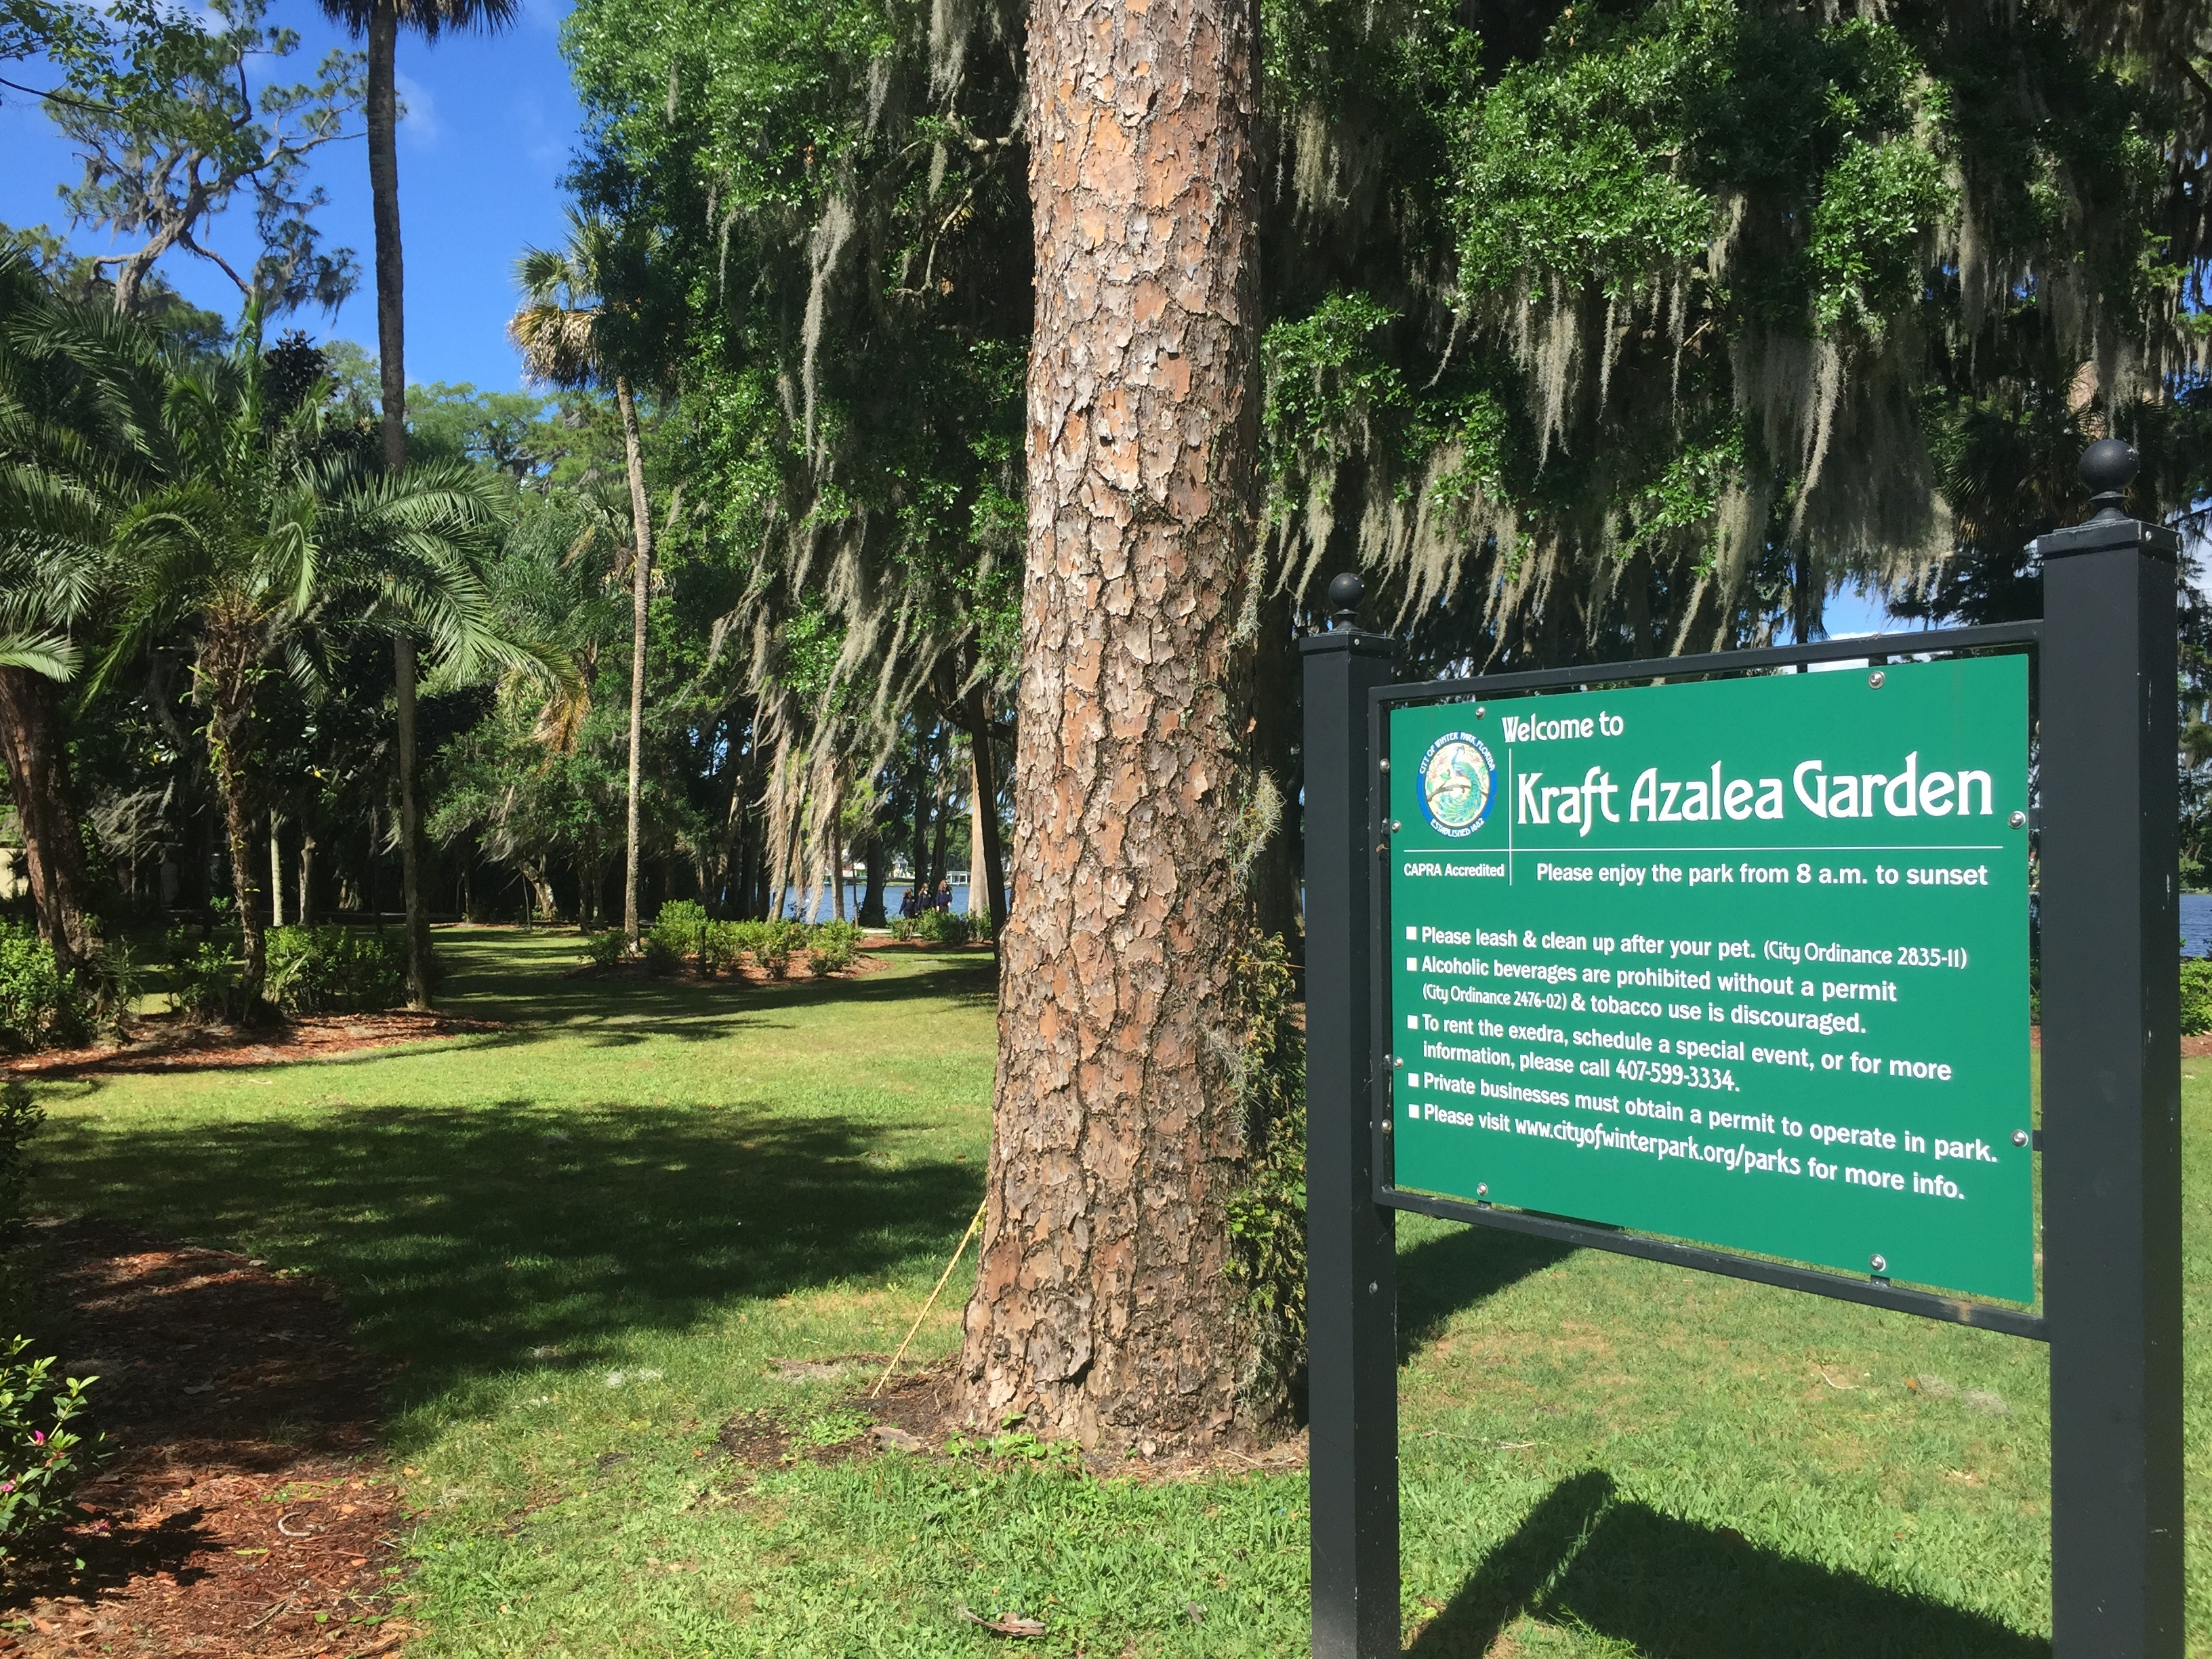 kraft azalea garden winter park